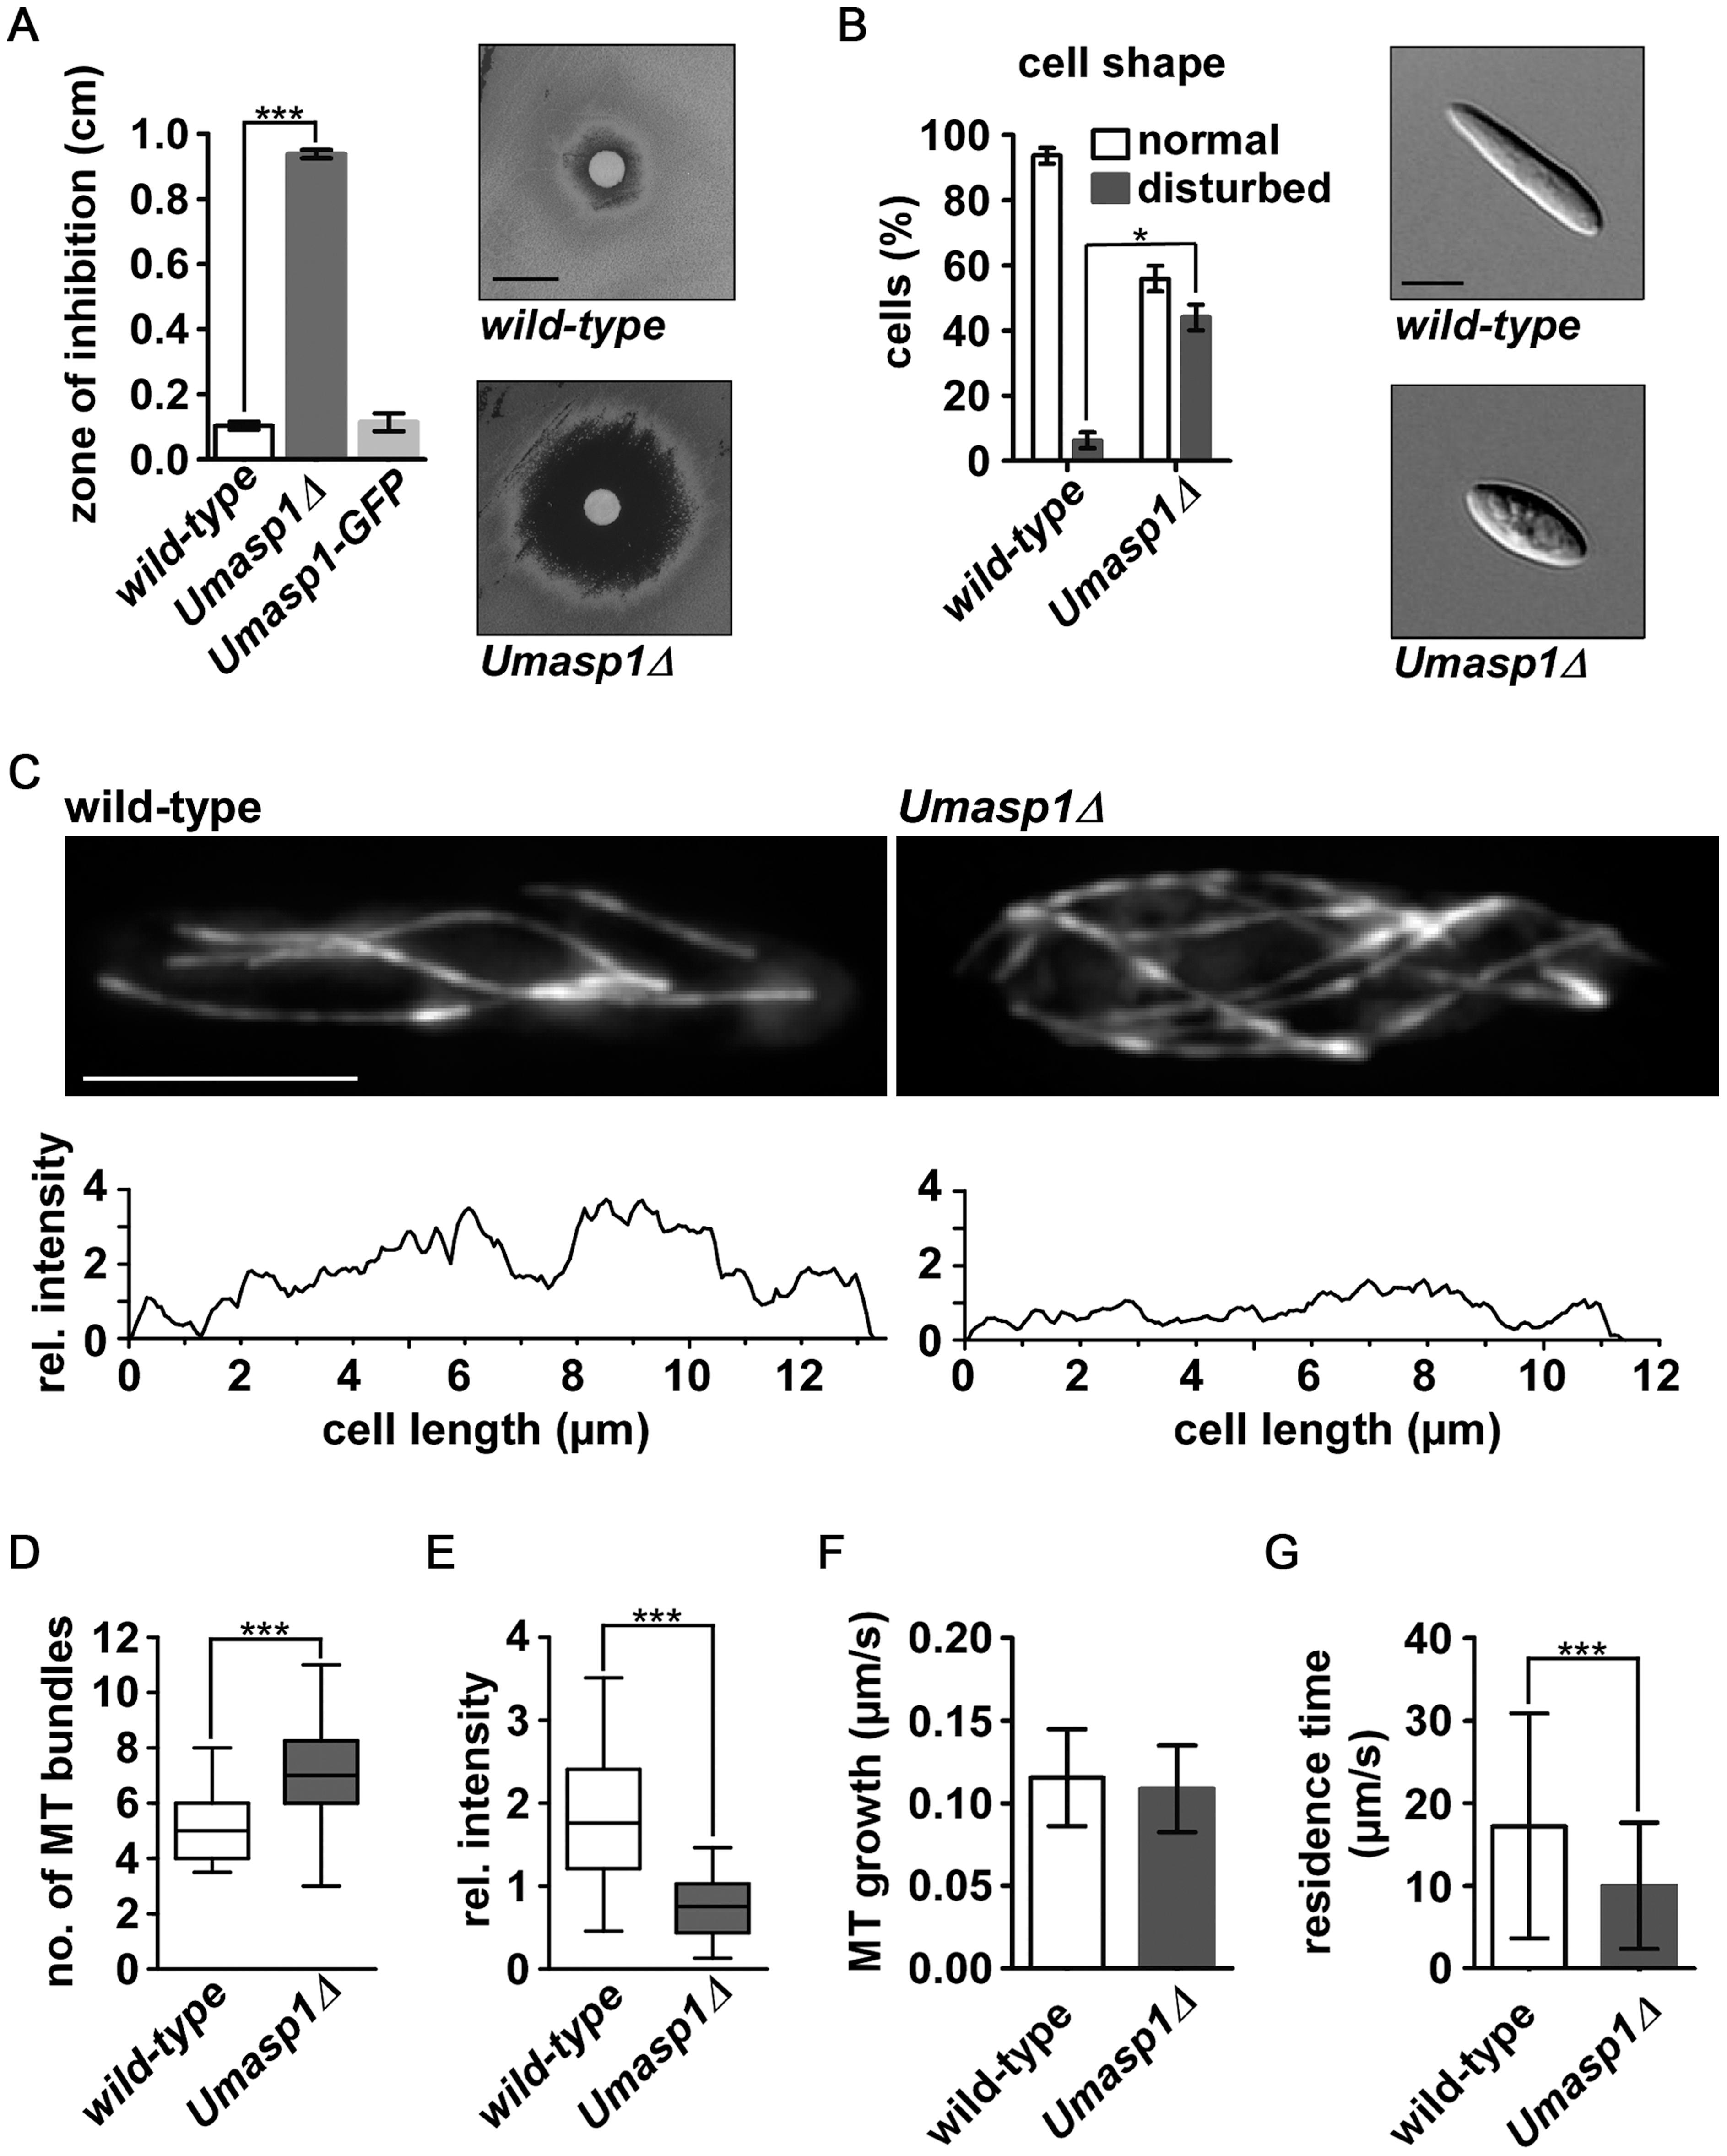 Loss of <i>Umasp1</i> causes aberrant morphology of and altered MT organization in <i>U. maydis</i> yeast cells.